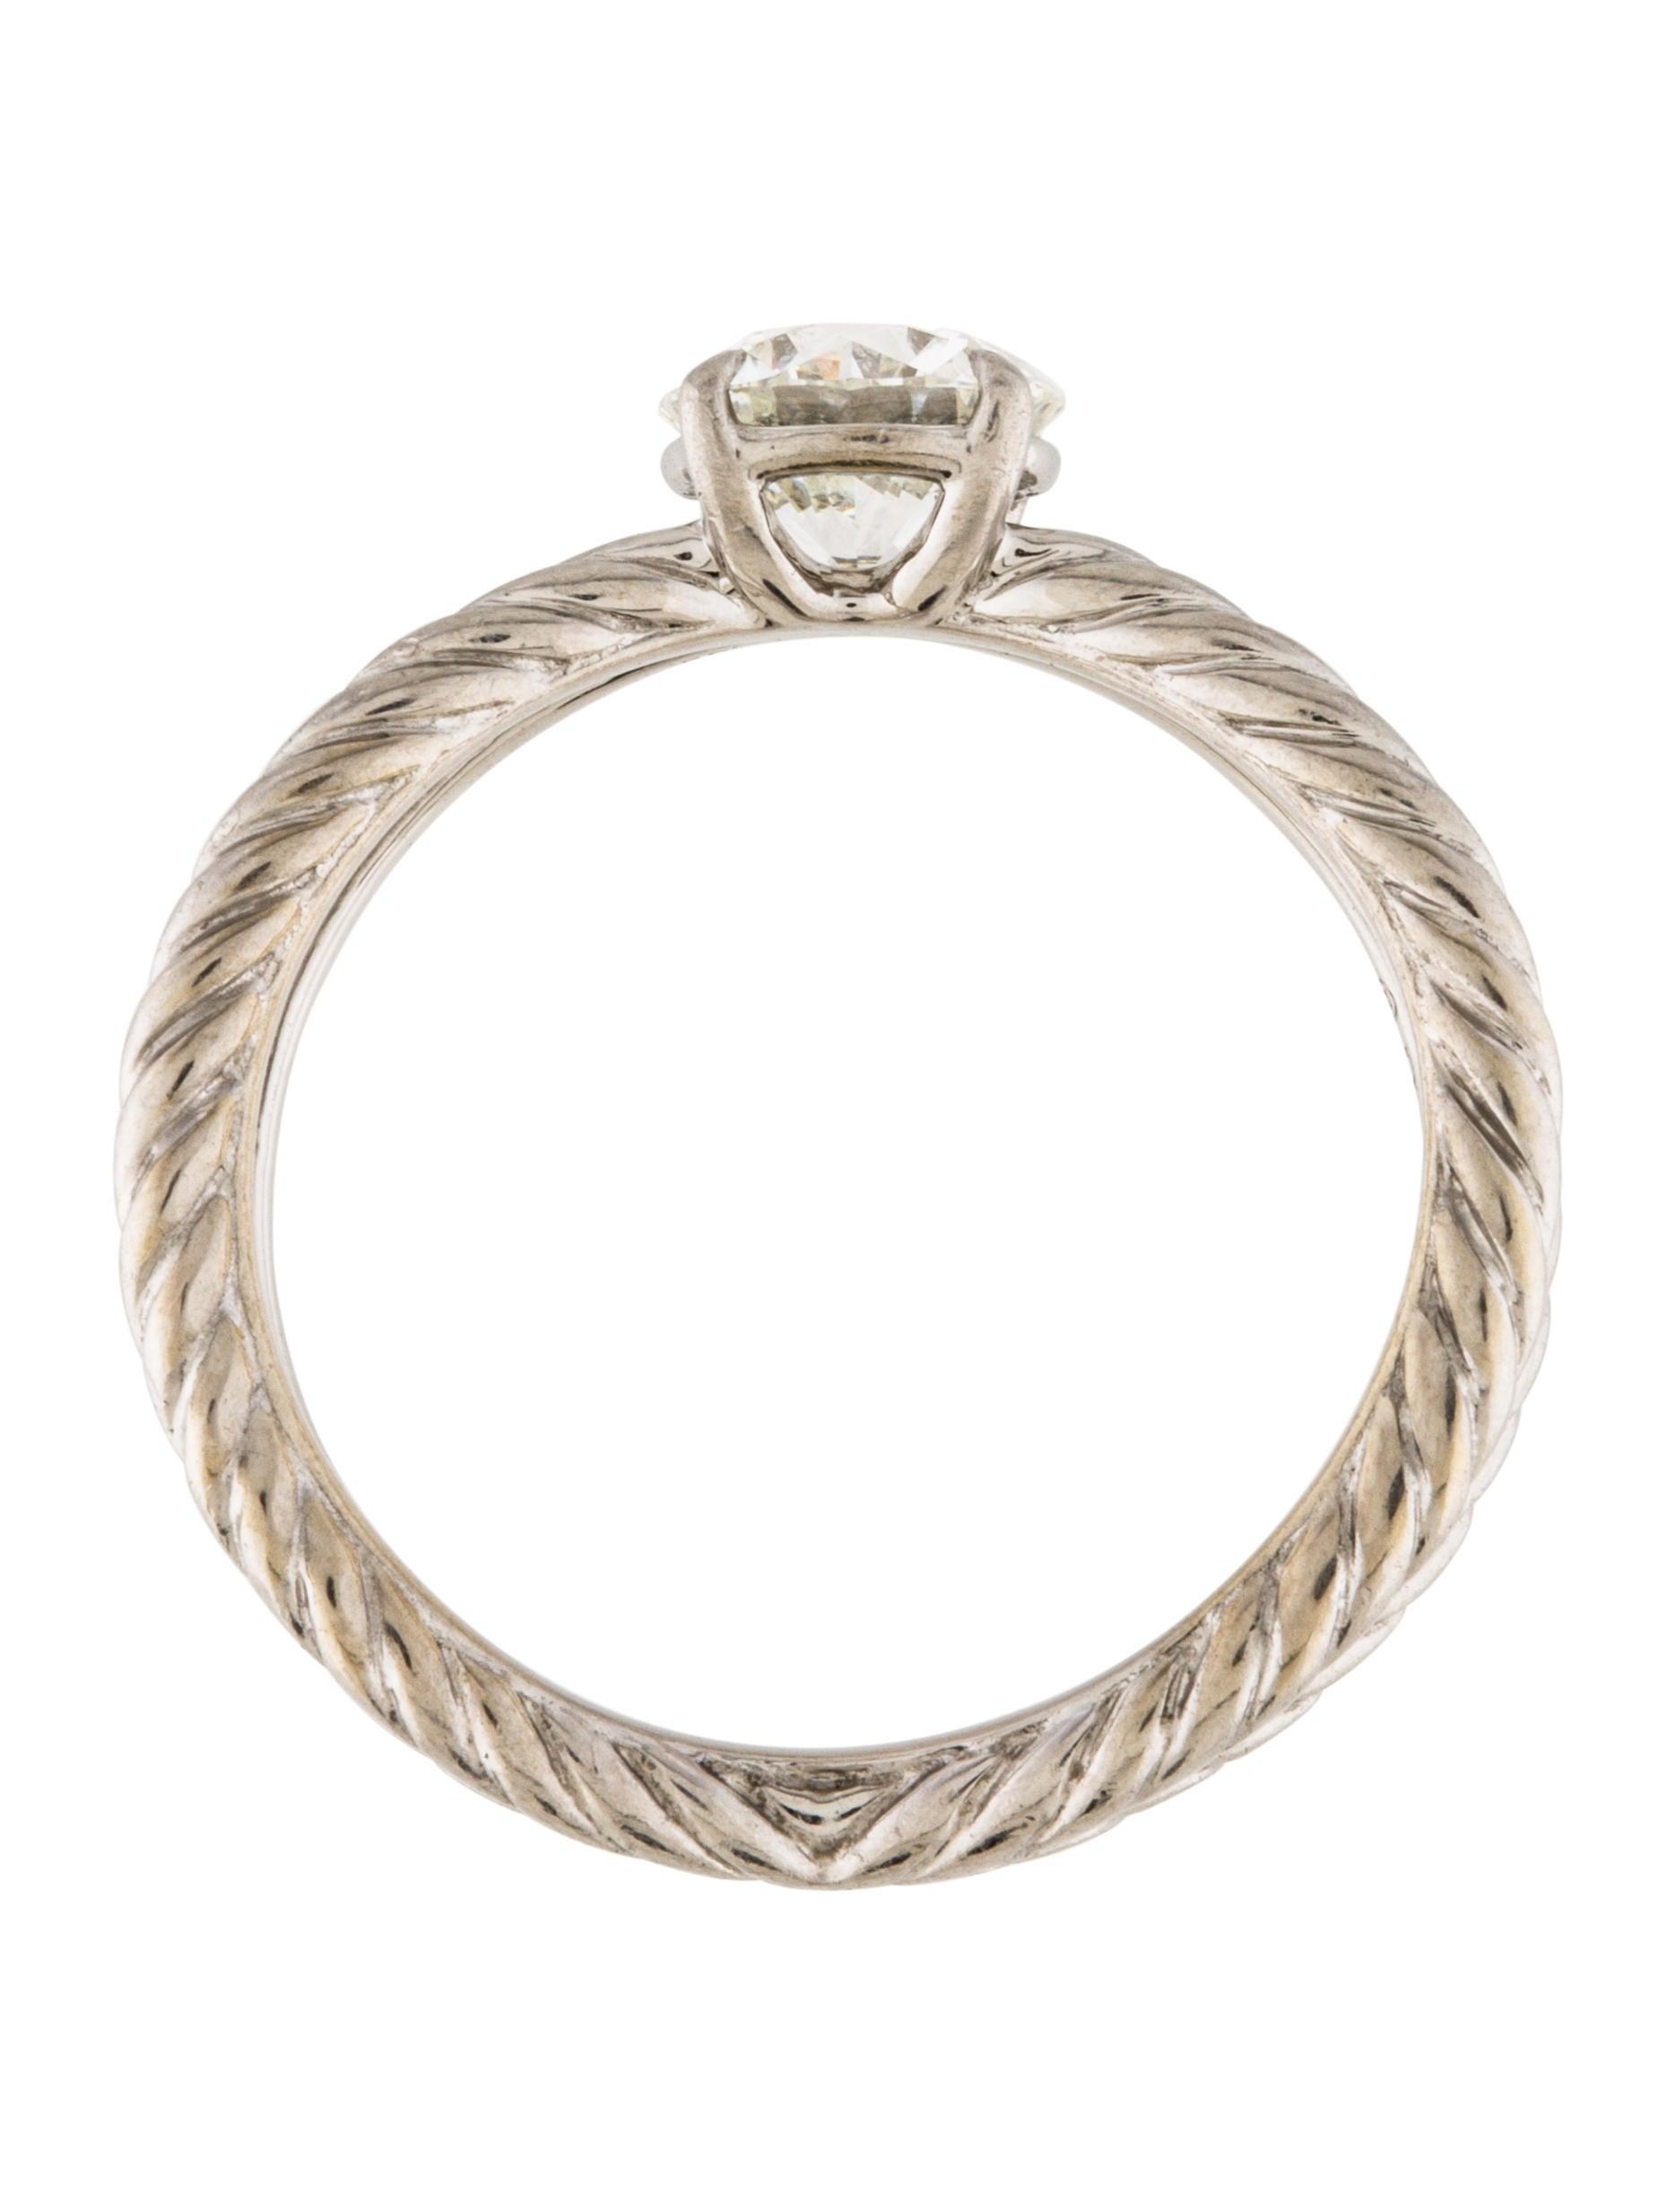 David yurman platinum diamond engagement ring rings for David yurman inspired jewelry rings